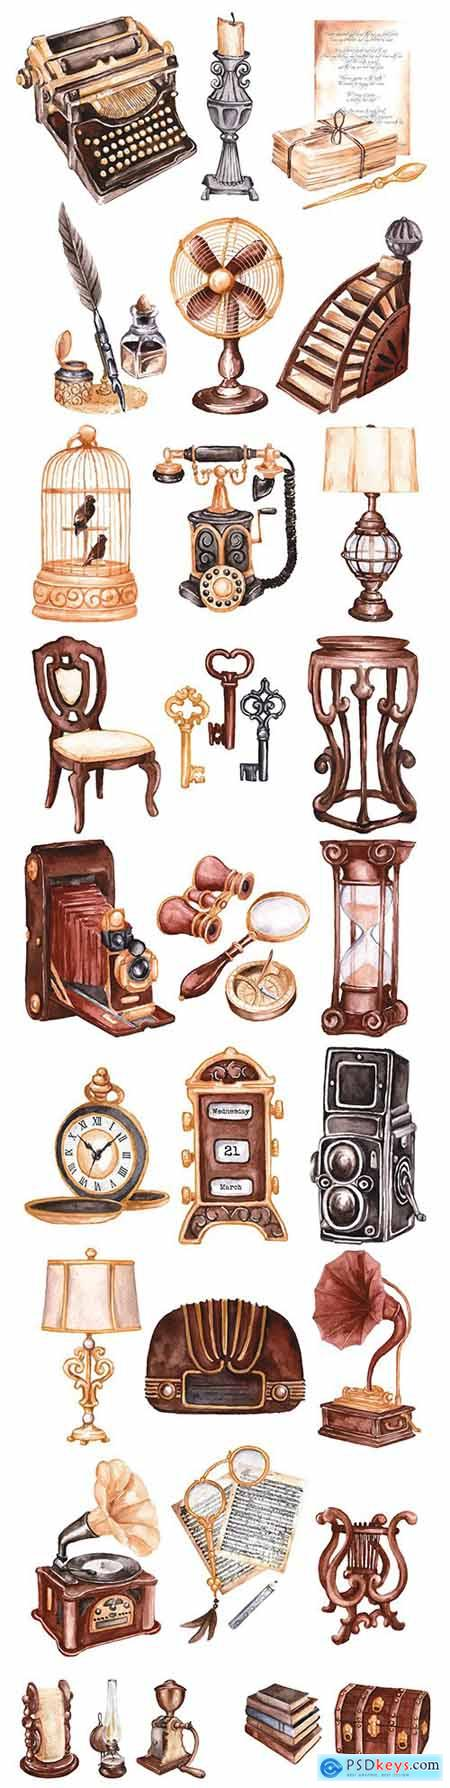 Watercolor antique market design collection illustration